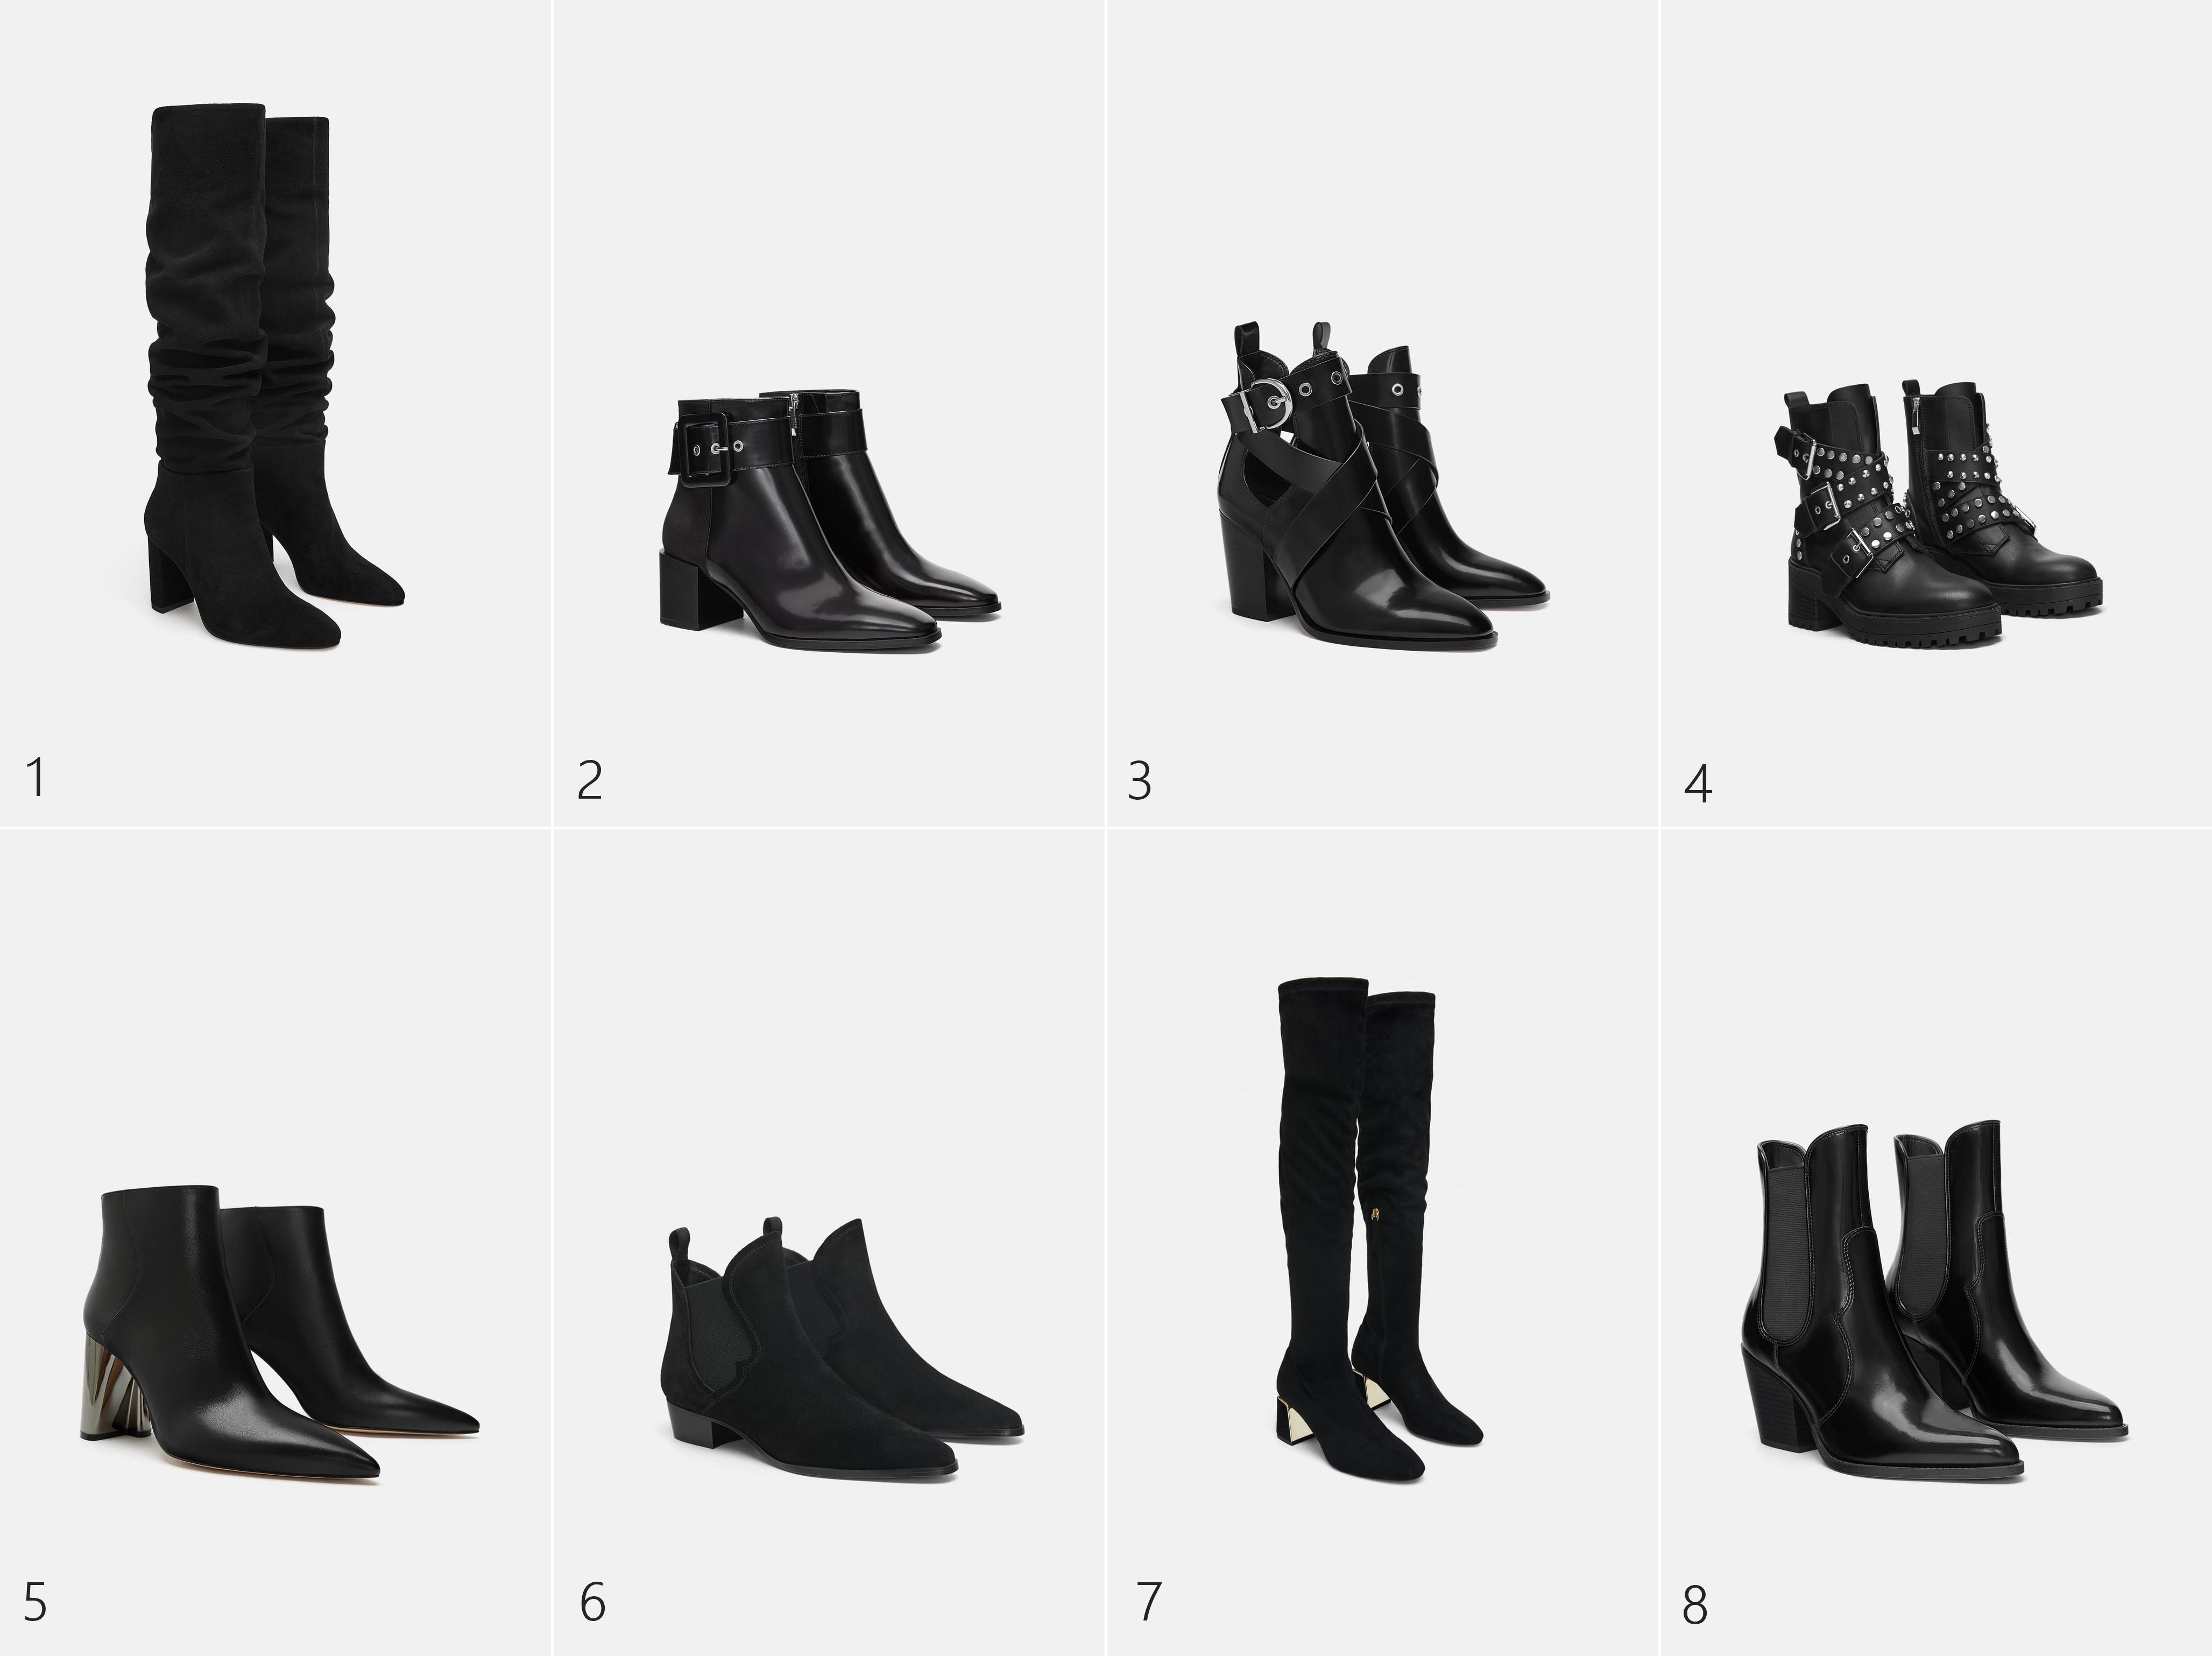 basicos-botines-negros-zara